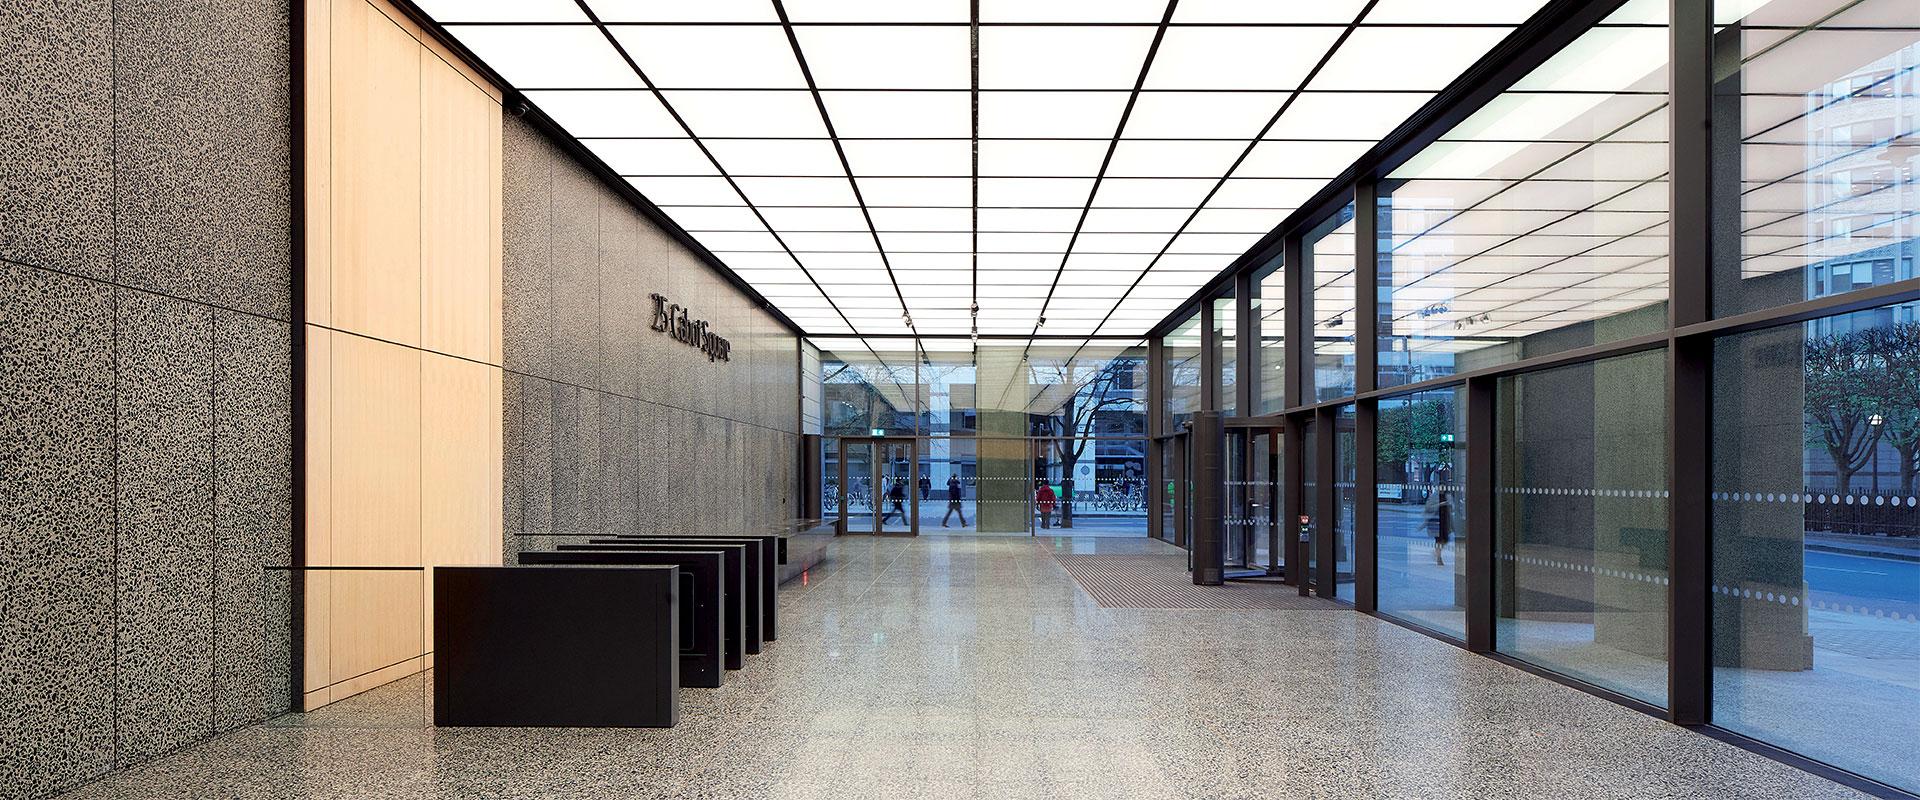 cabot-square---london-nited-kingdom---SB-260---centri-direzionali-05---OK